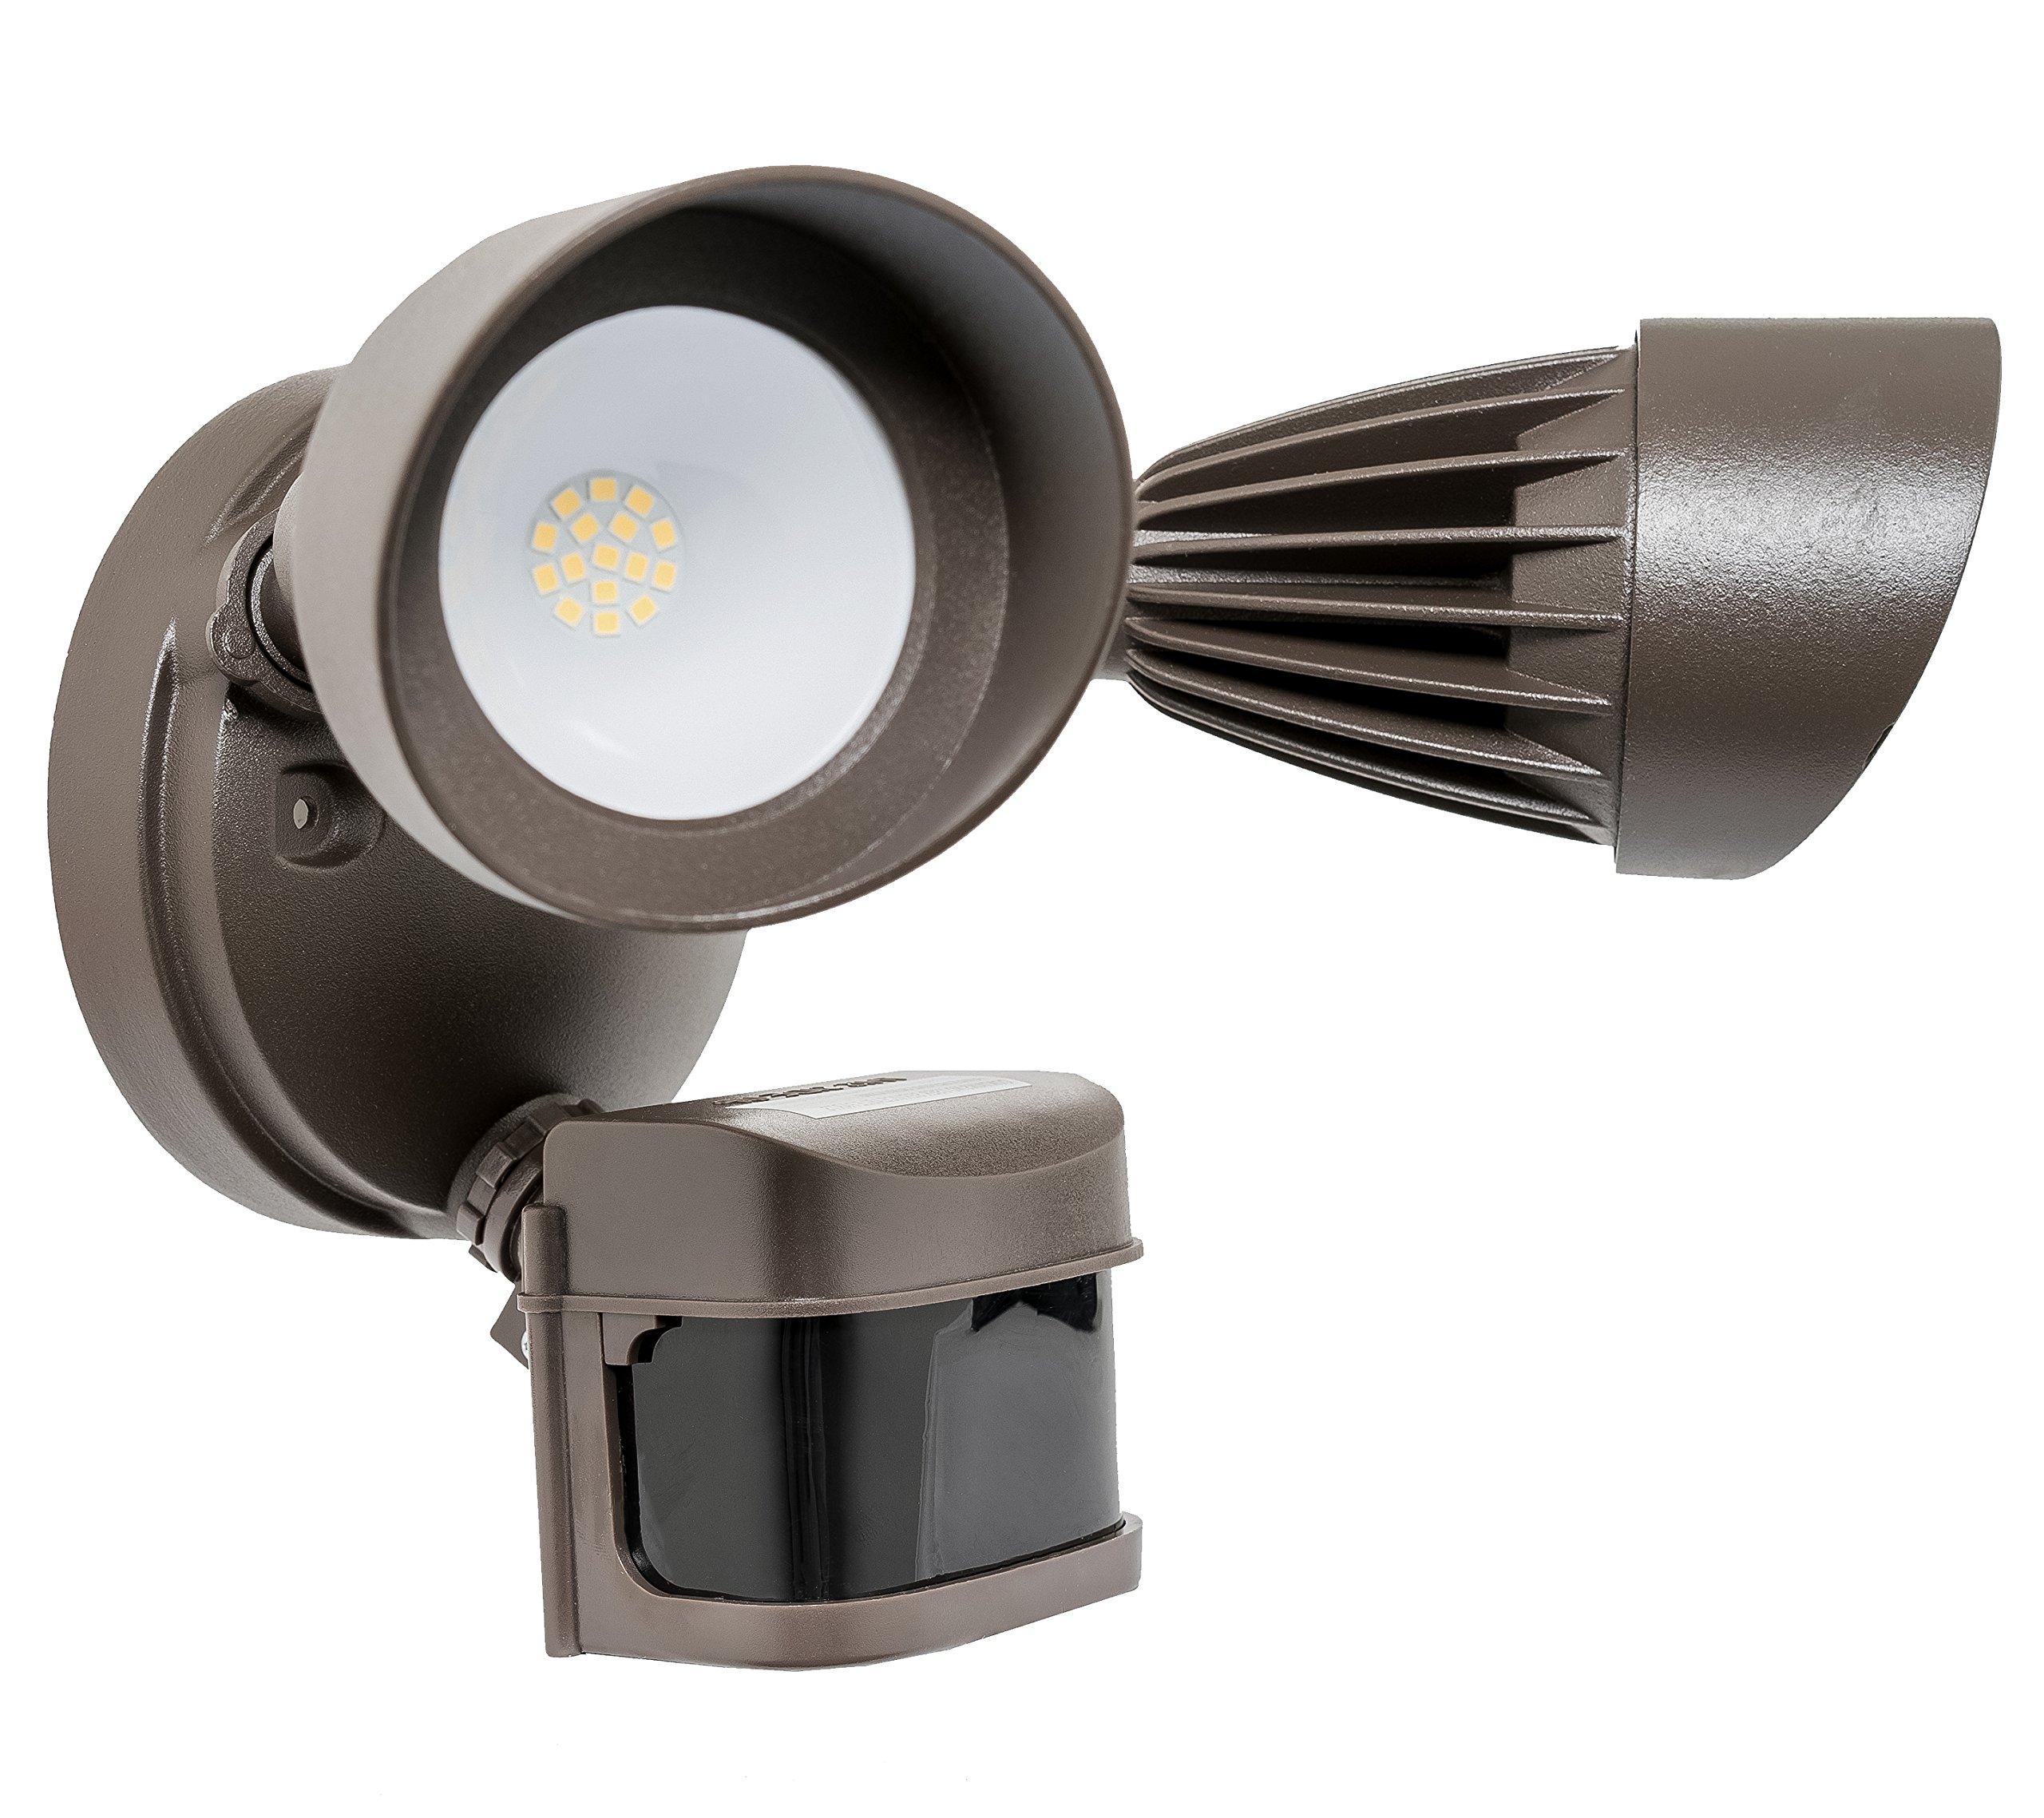 Westgate Lighting LED Outdoor Security Light– Waterproof IP65- Die-Cast Aluminum- High Lumen- Tempered Glass Lens- UL Listed – 100-120V AC (1, 3000K Soft White)